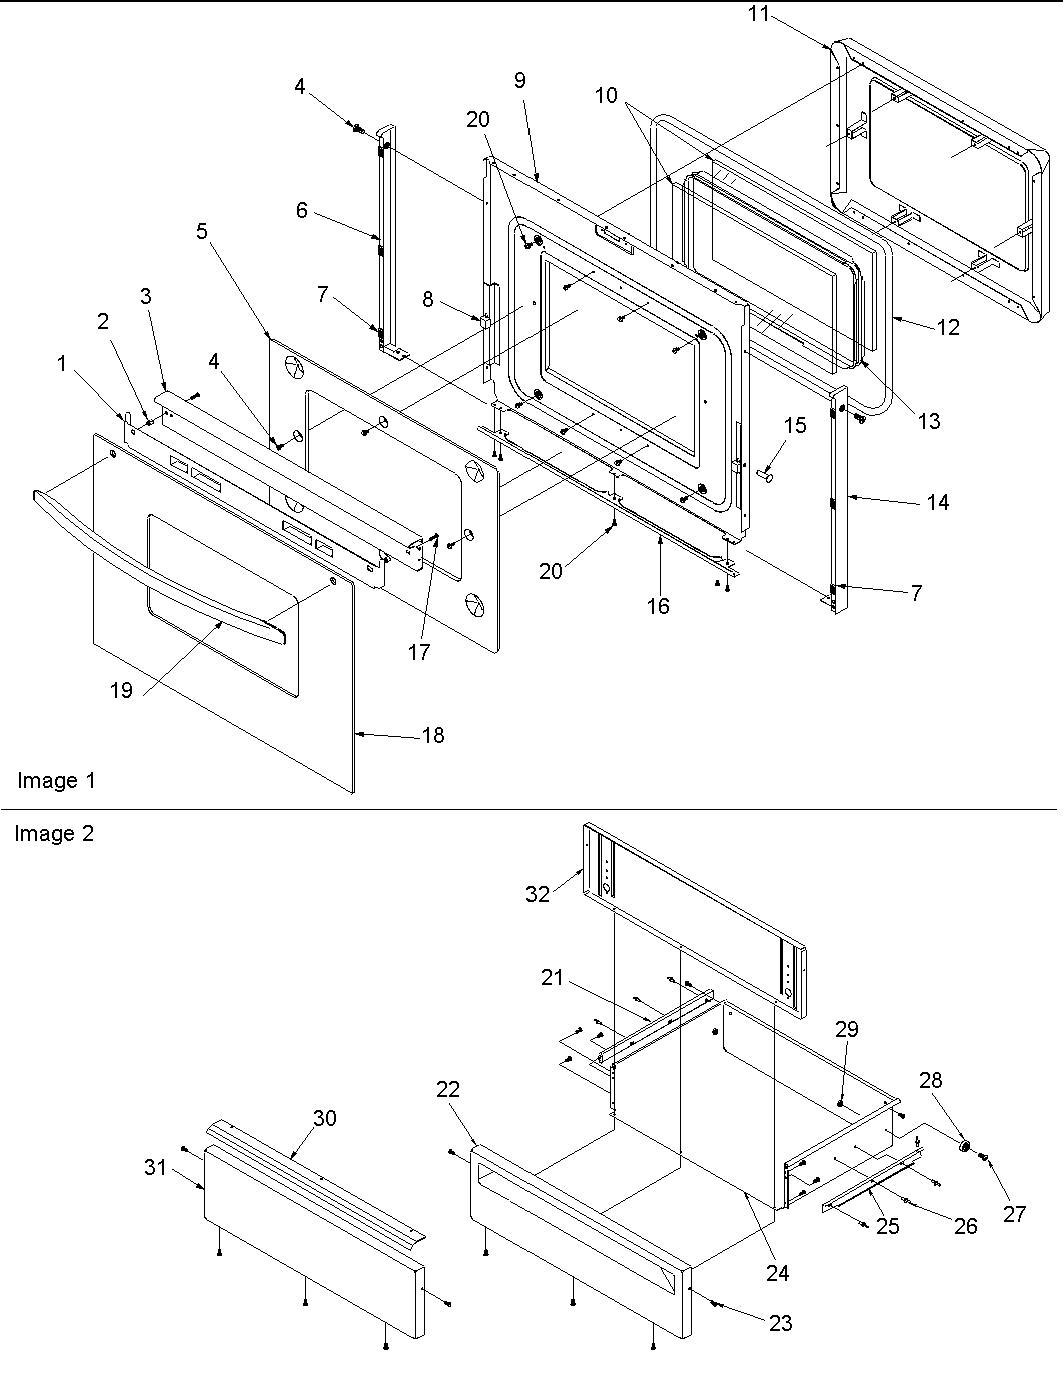 Air cleaner toyota part list|jp cat 5 socket wiring diagram m0312601 00006